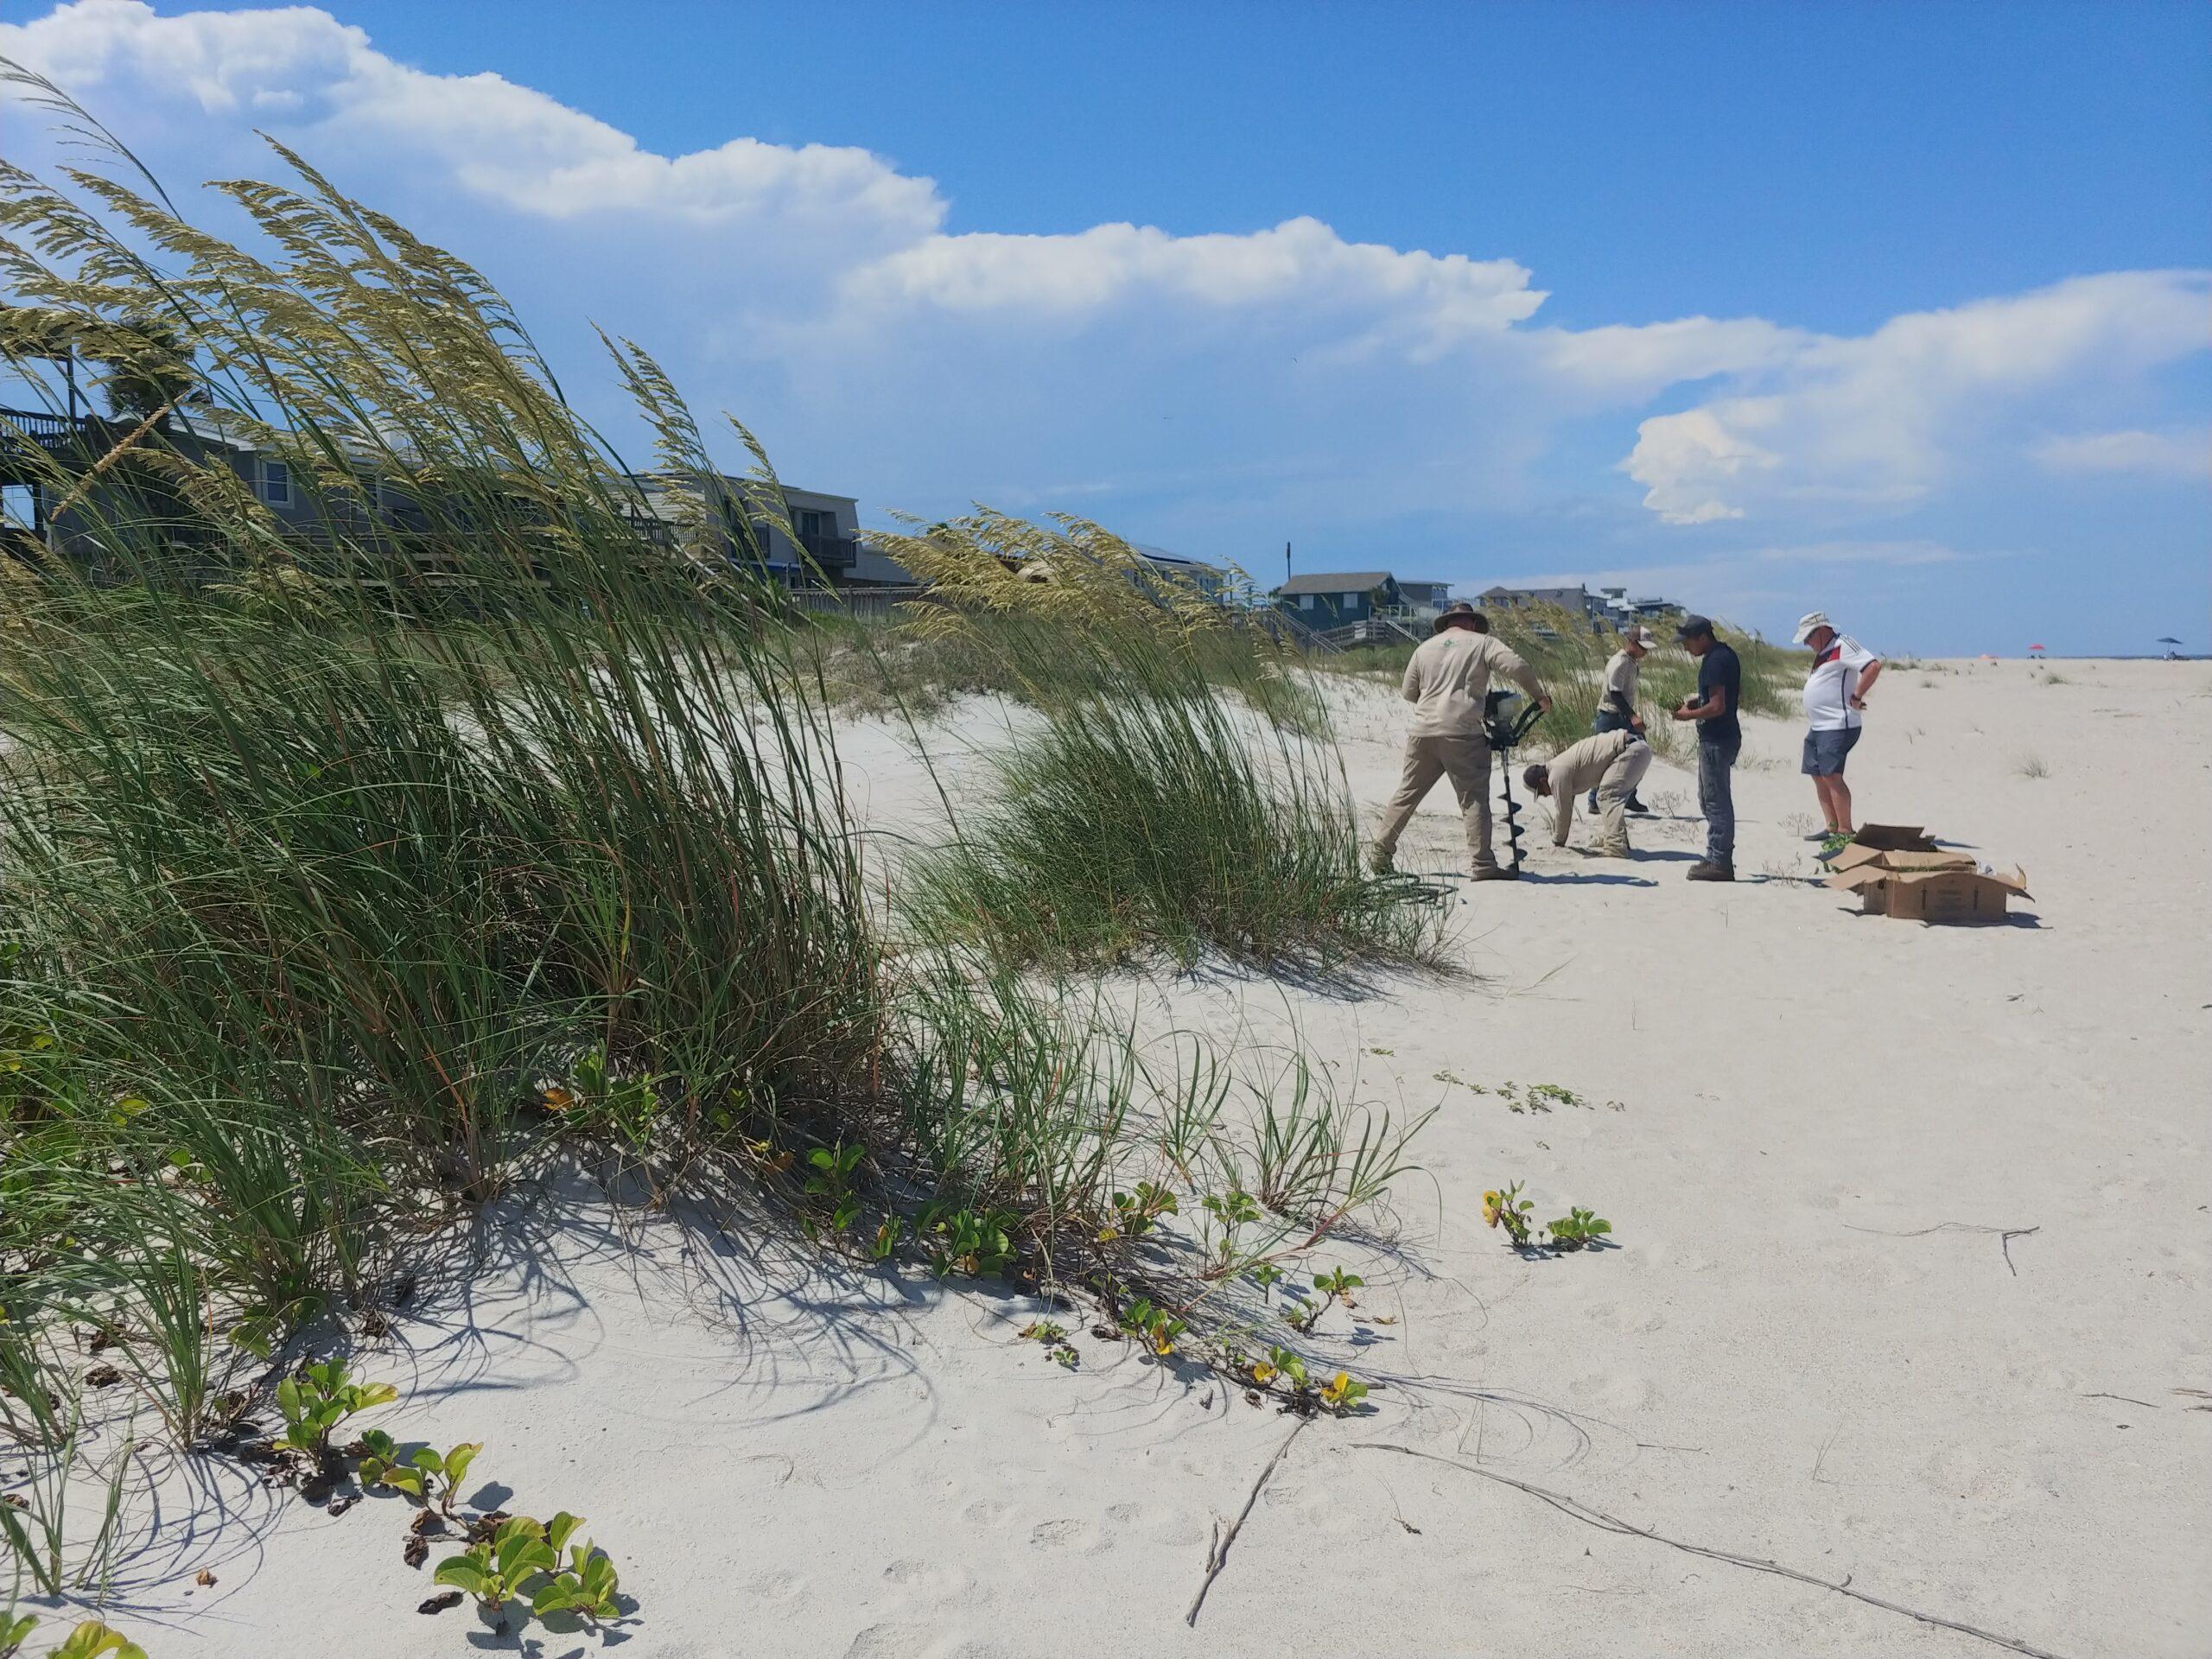 Dune Science Group native vegetation installation for homeowner dune restoration